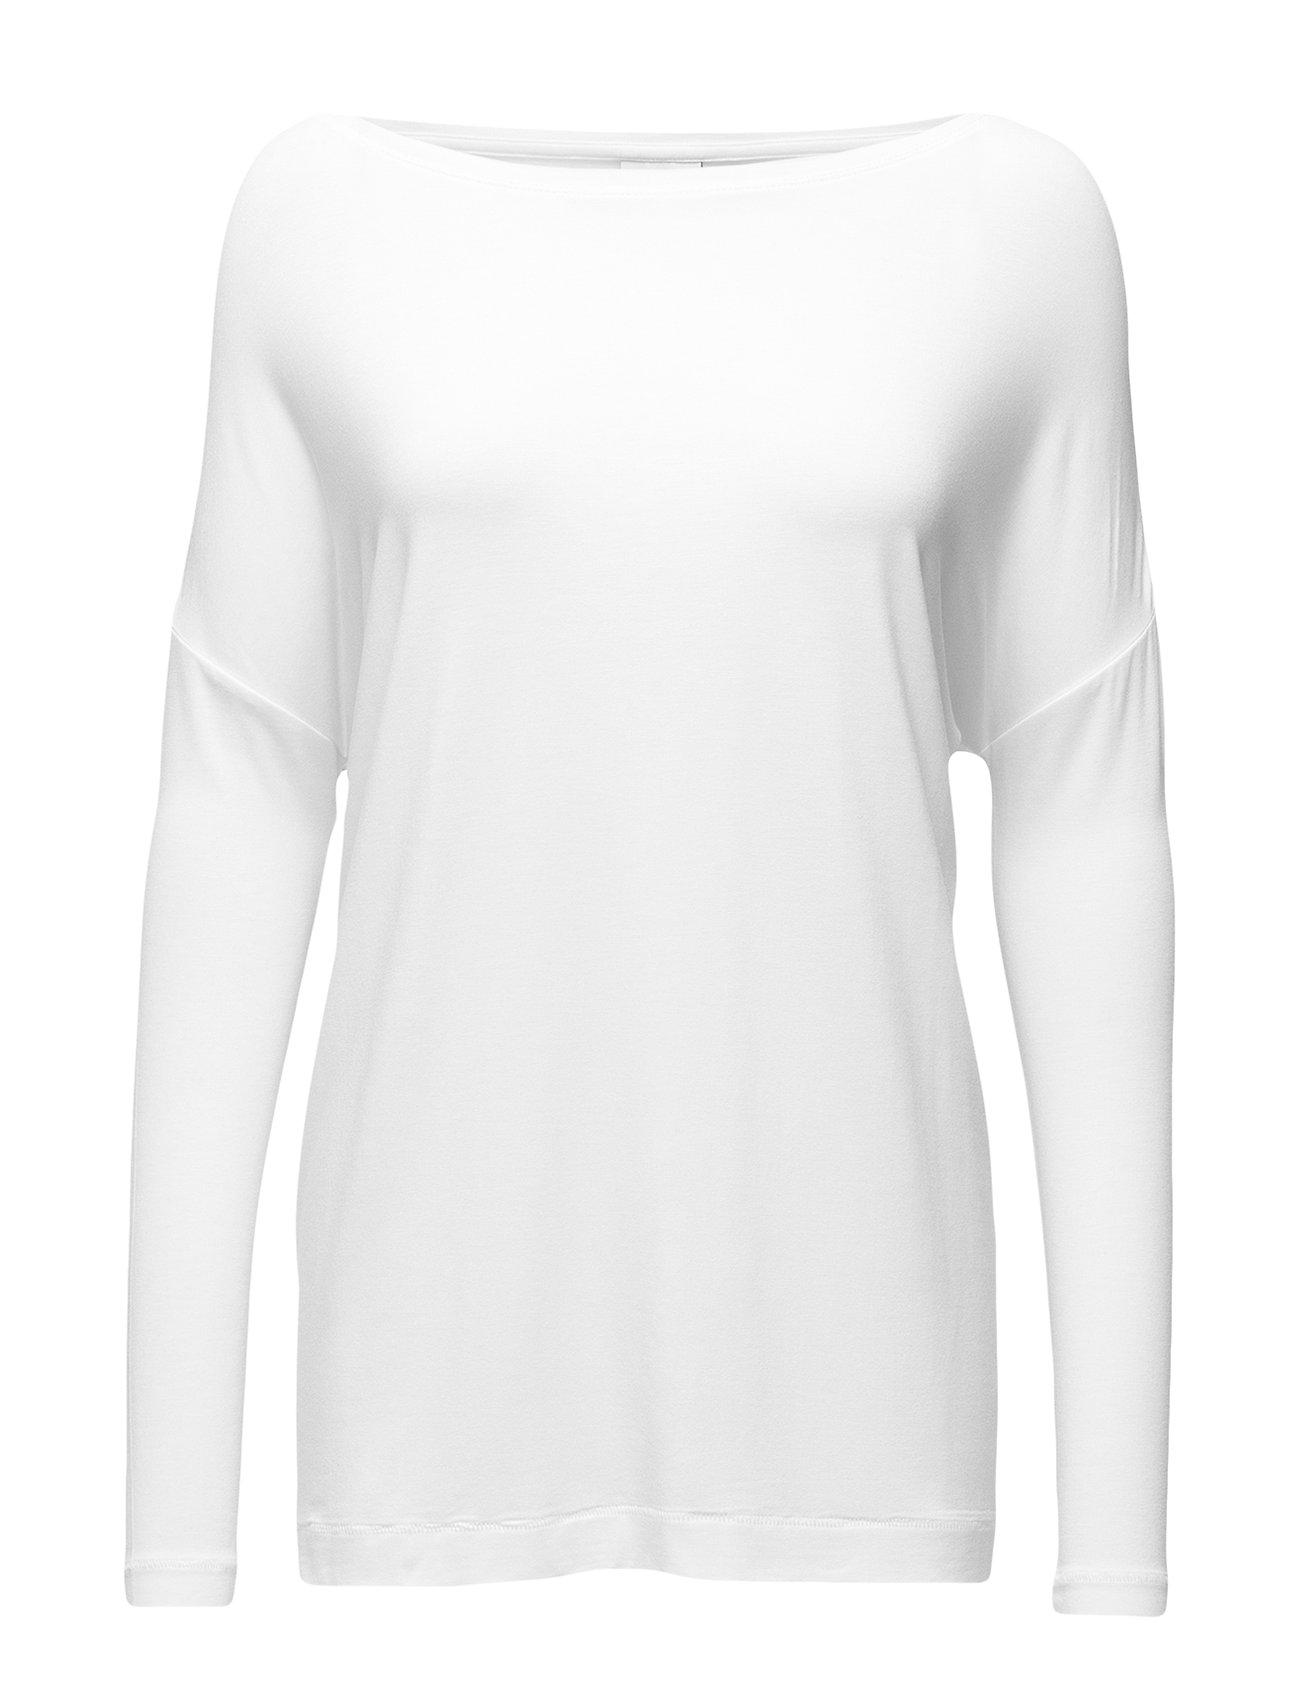 Image of Alloi Langærmet T-shirt Hvid By Malene Birger (2421321743)